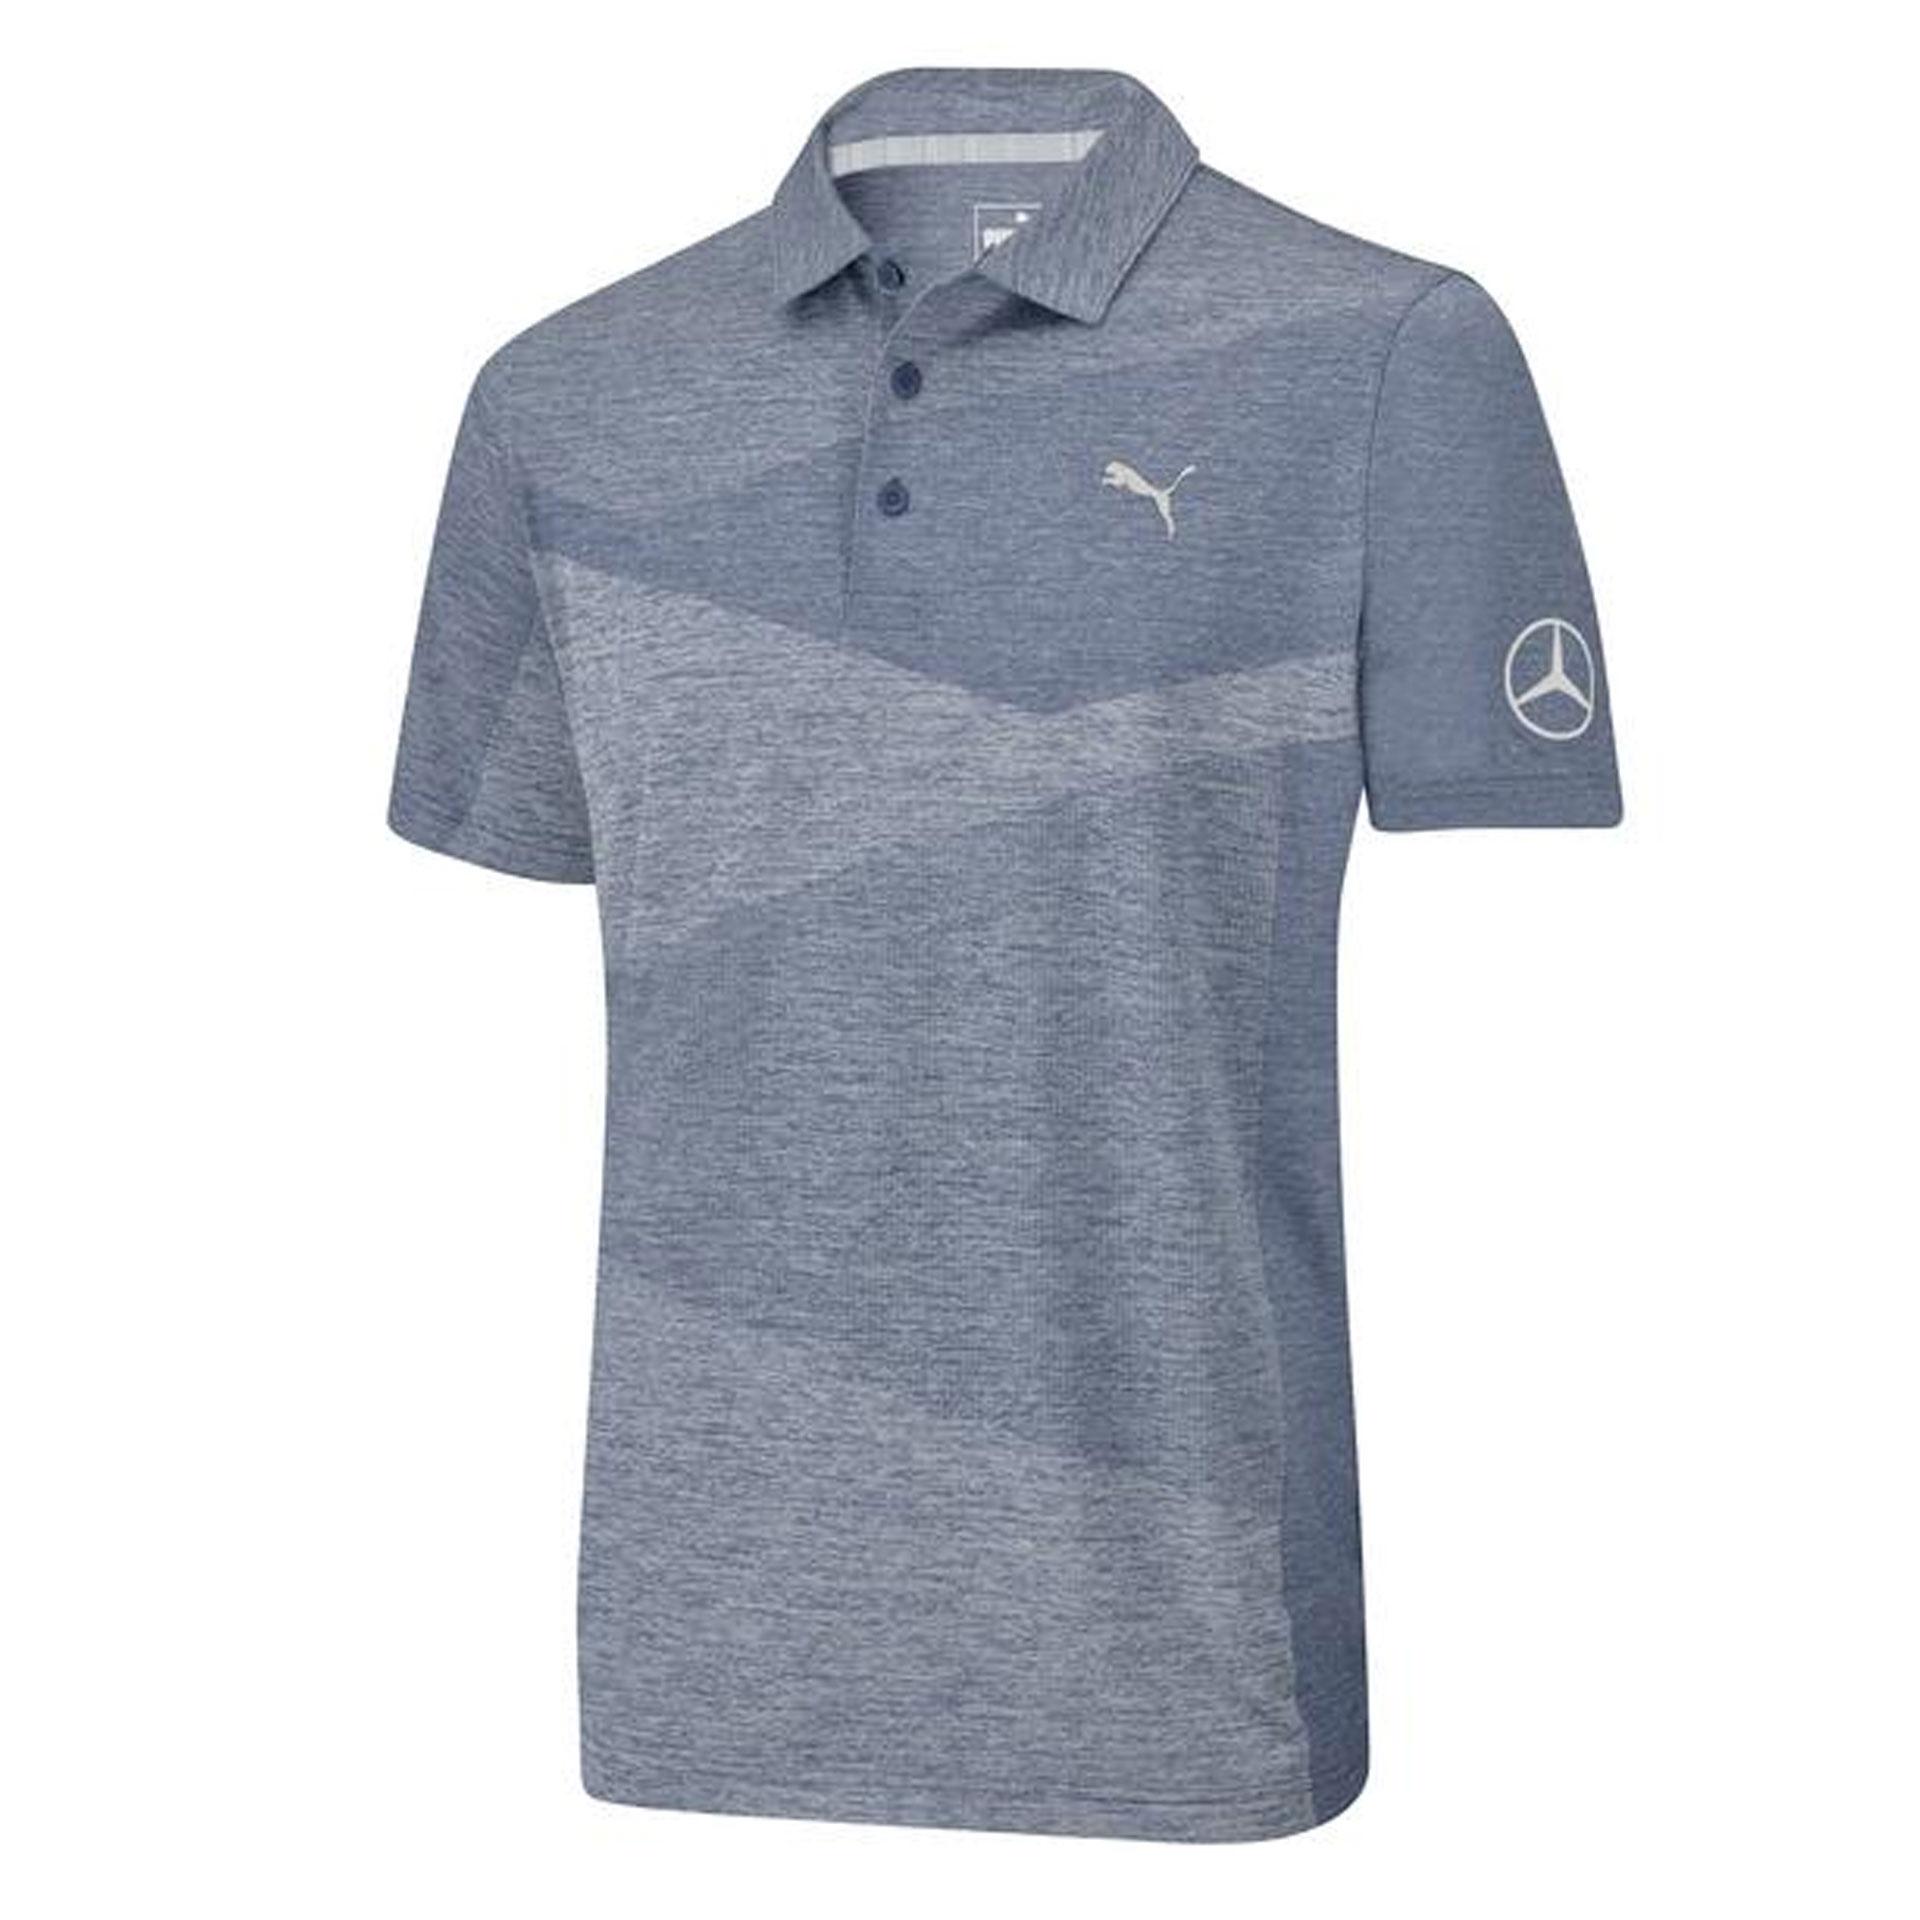 Mercedes-Benz Golf-Poloshirt Herren blau by PUMA Poloshirt